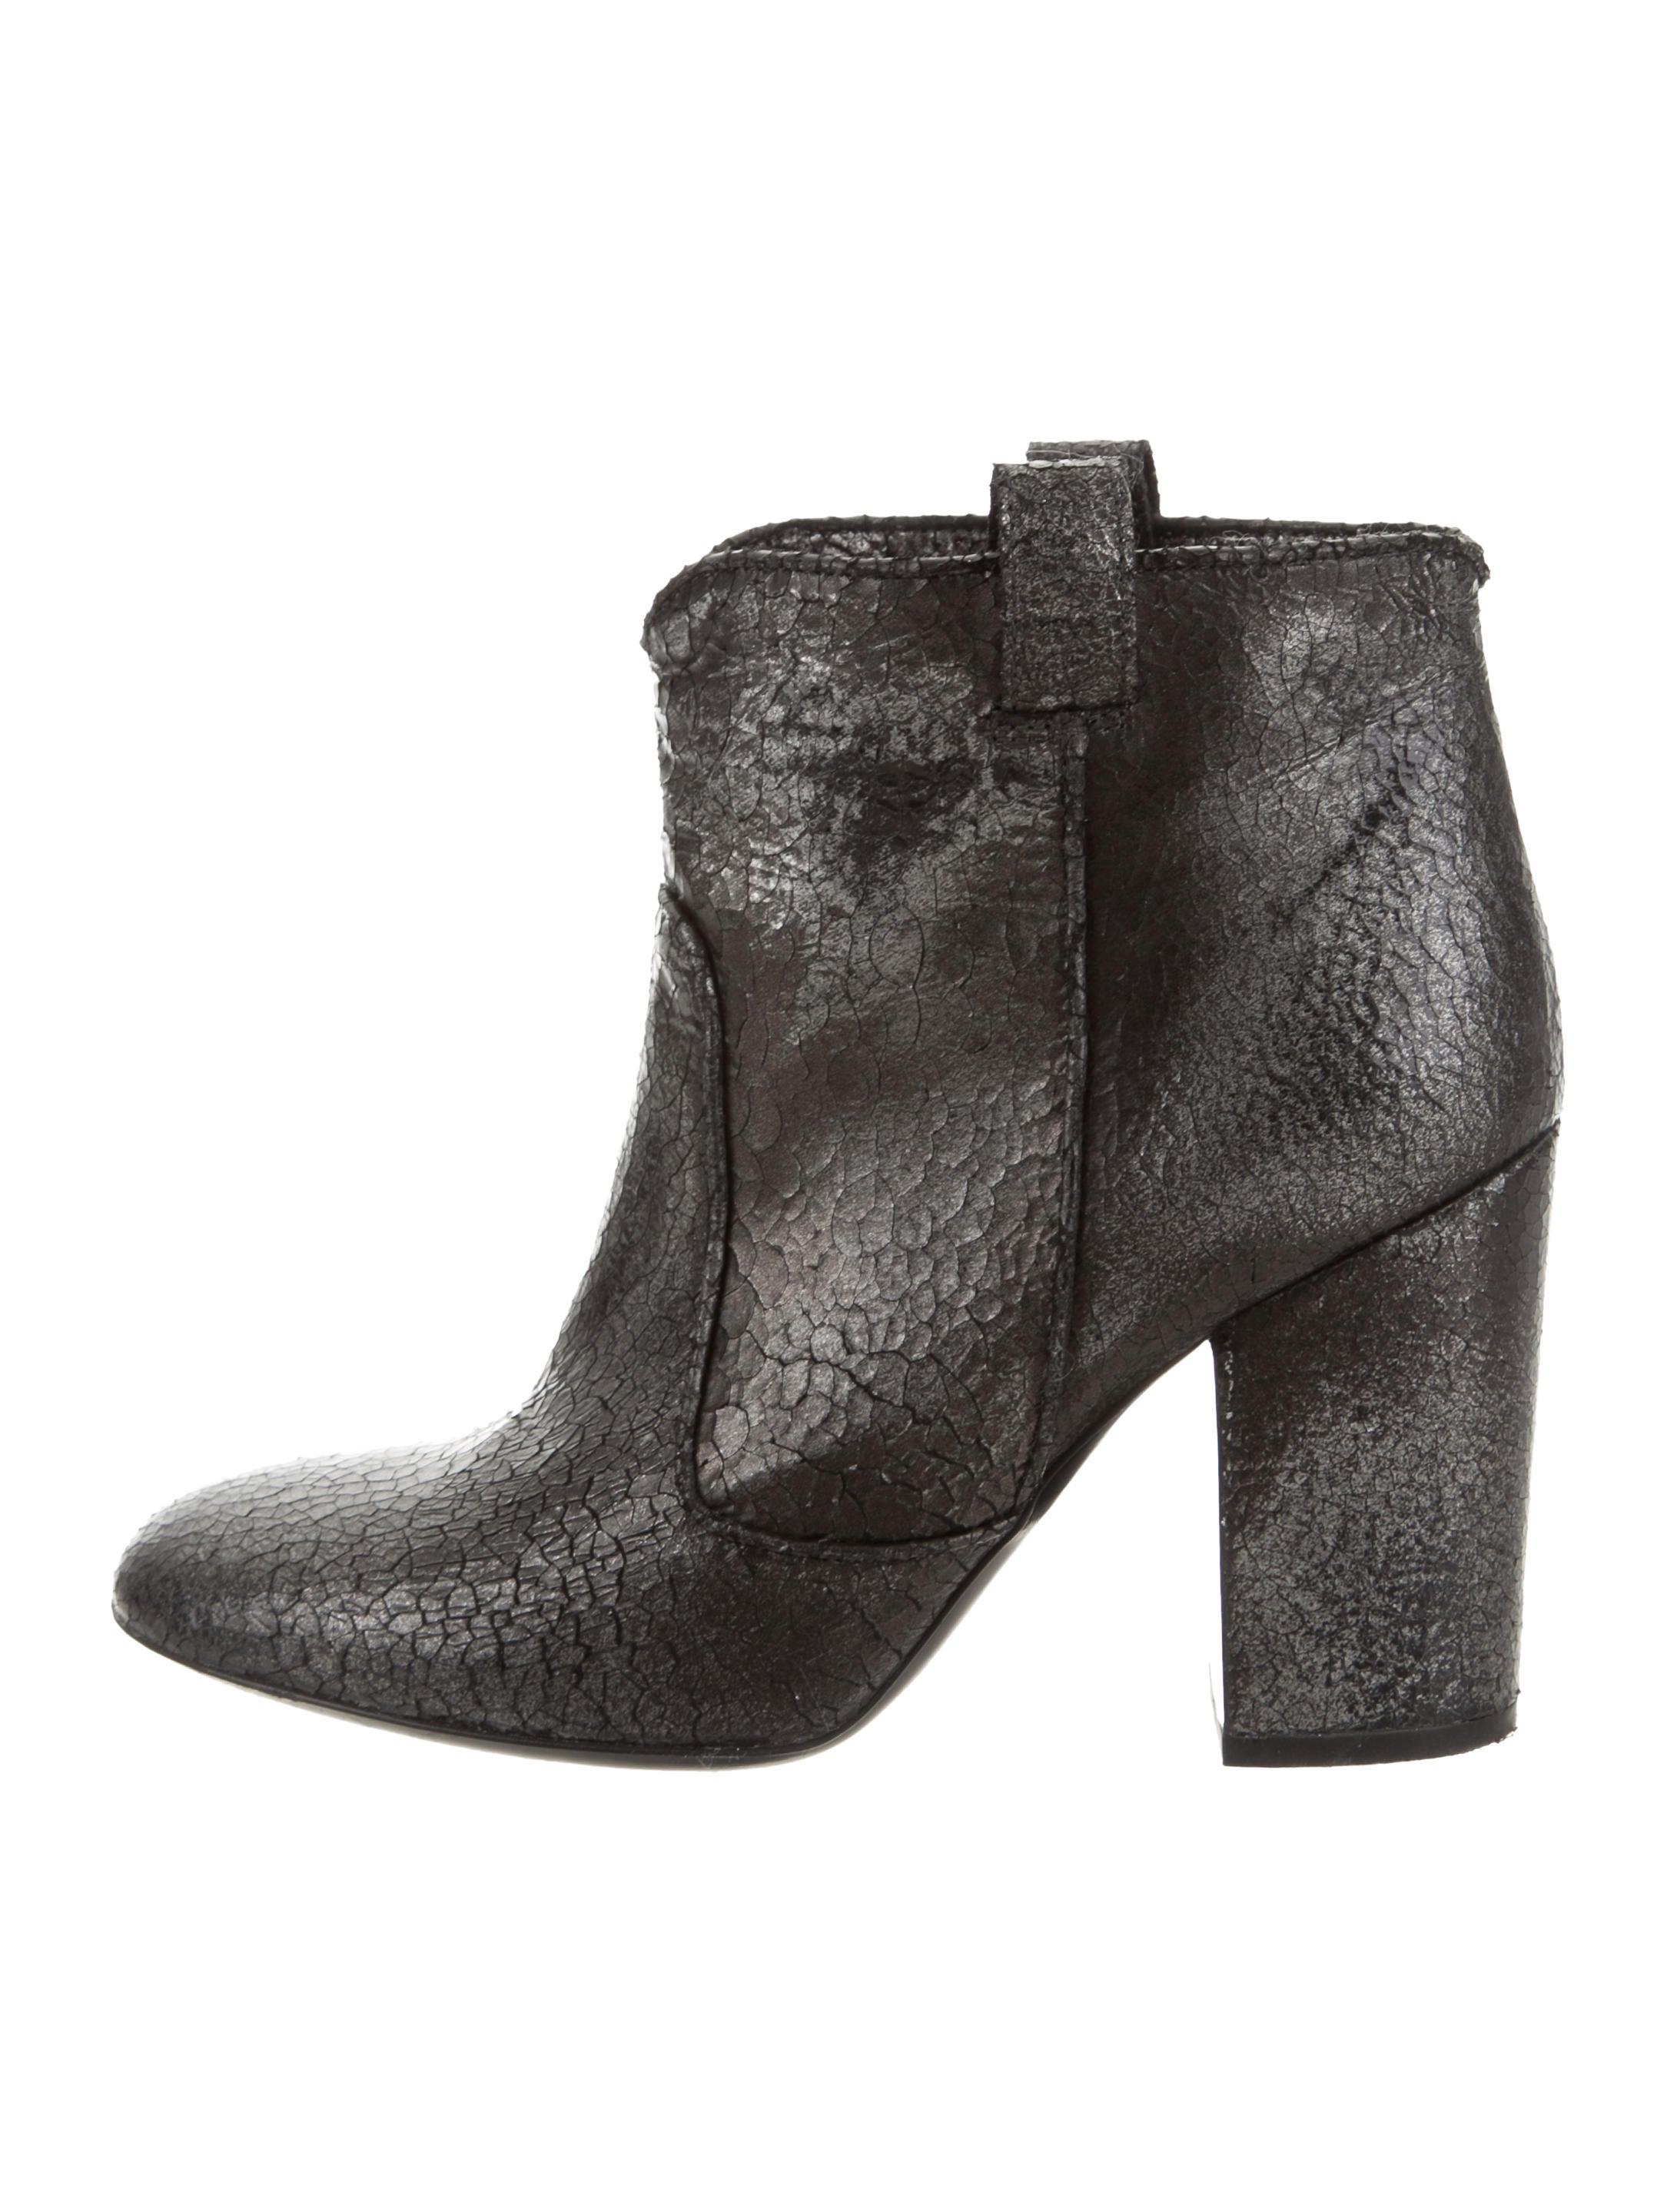 Laurence Dacade Metallic Ankle Boots buy cheap enjoy wHKYSe